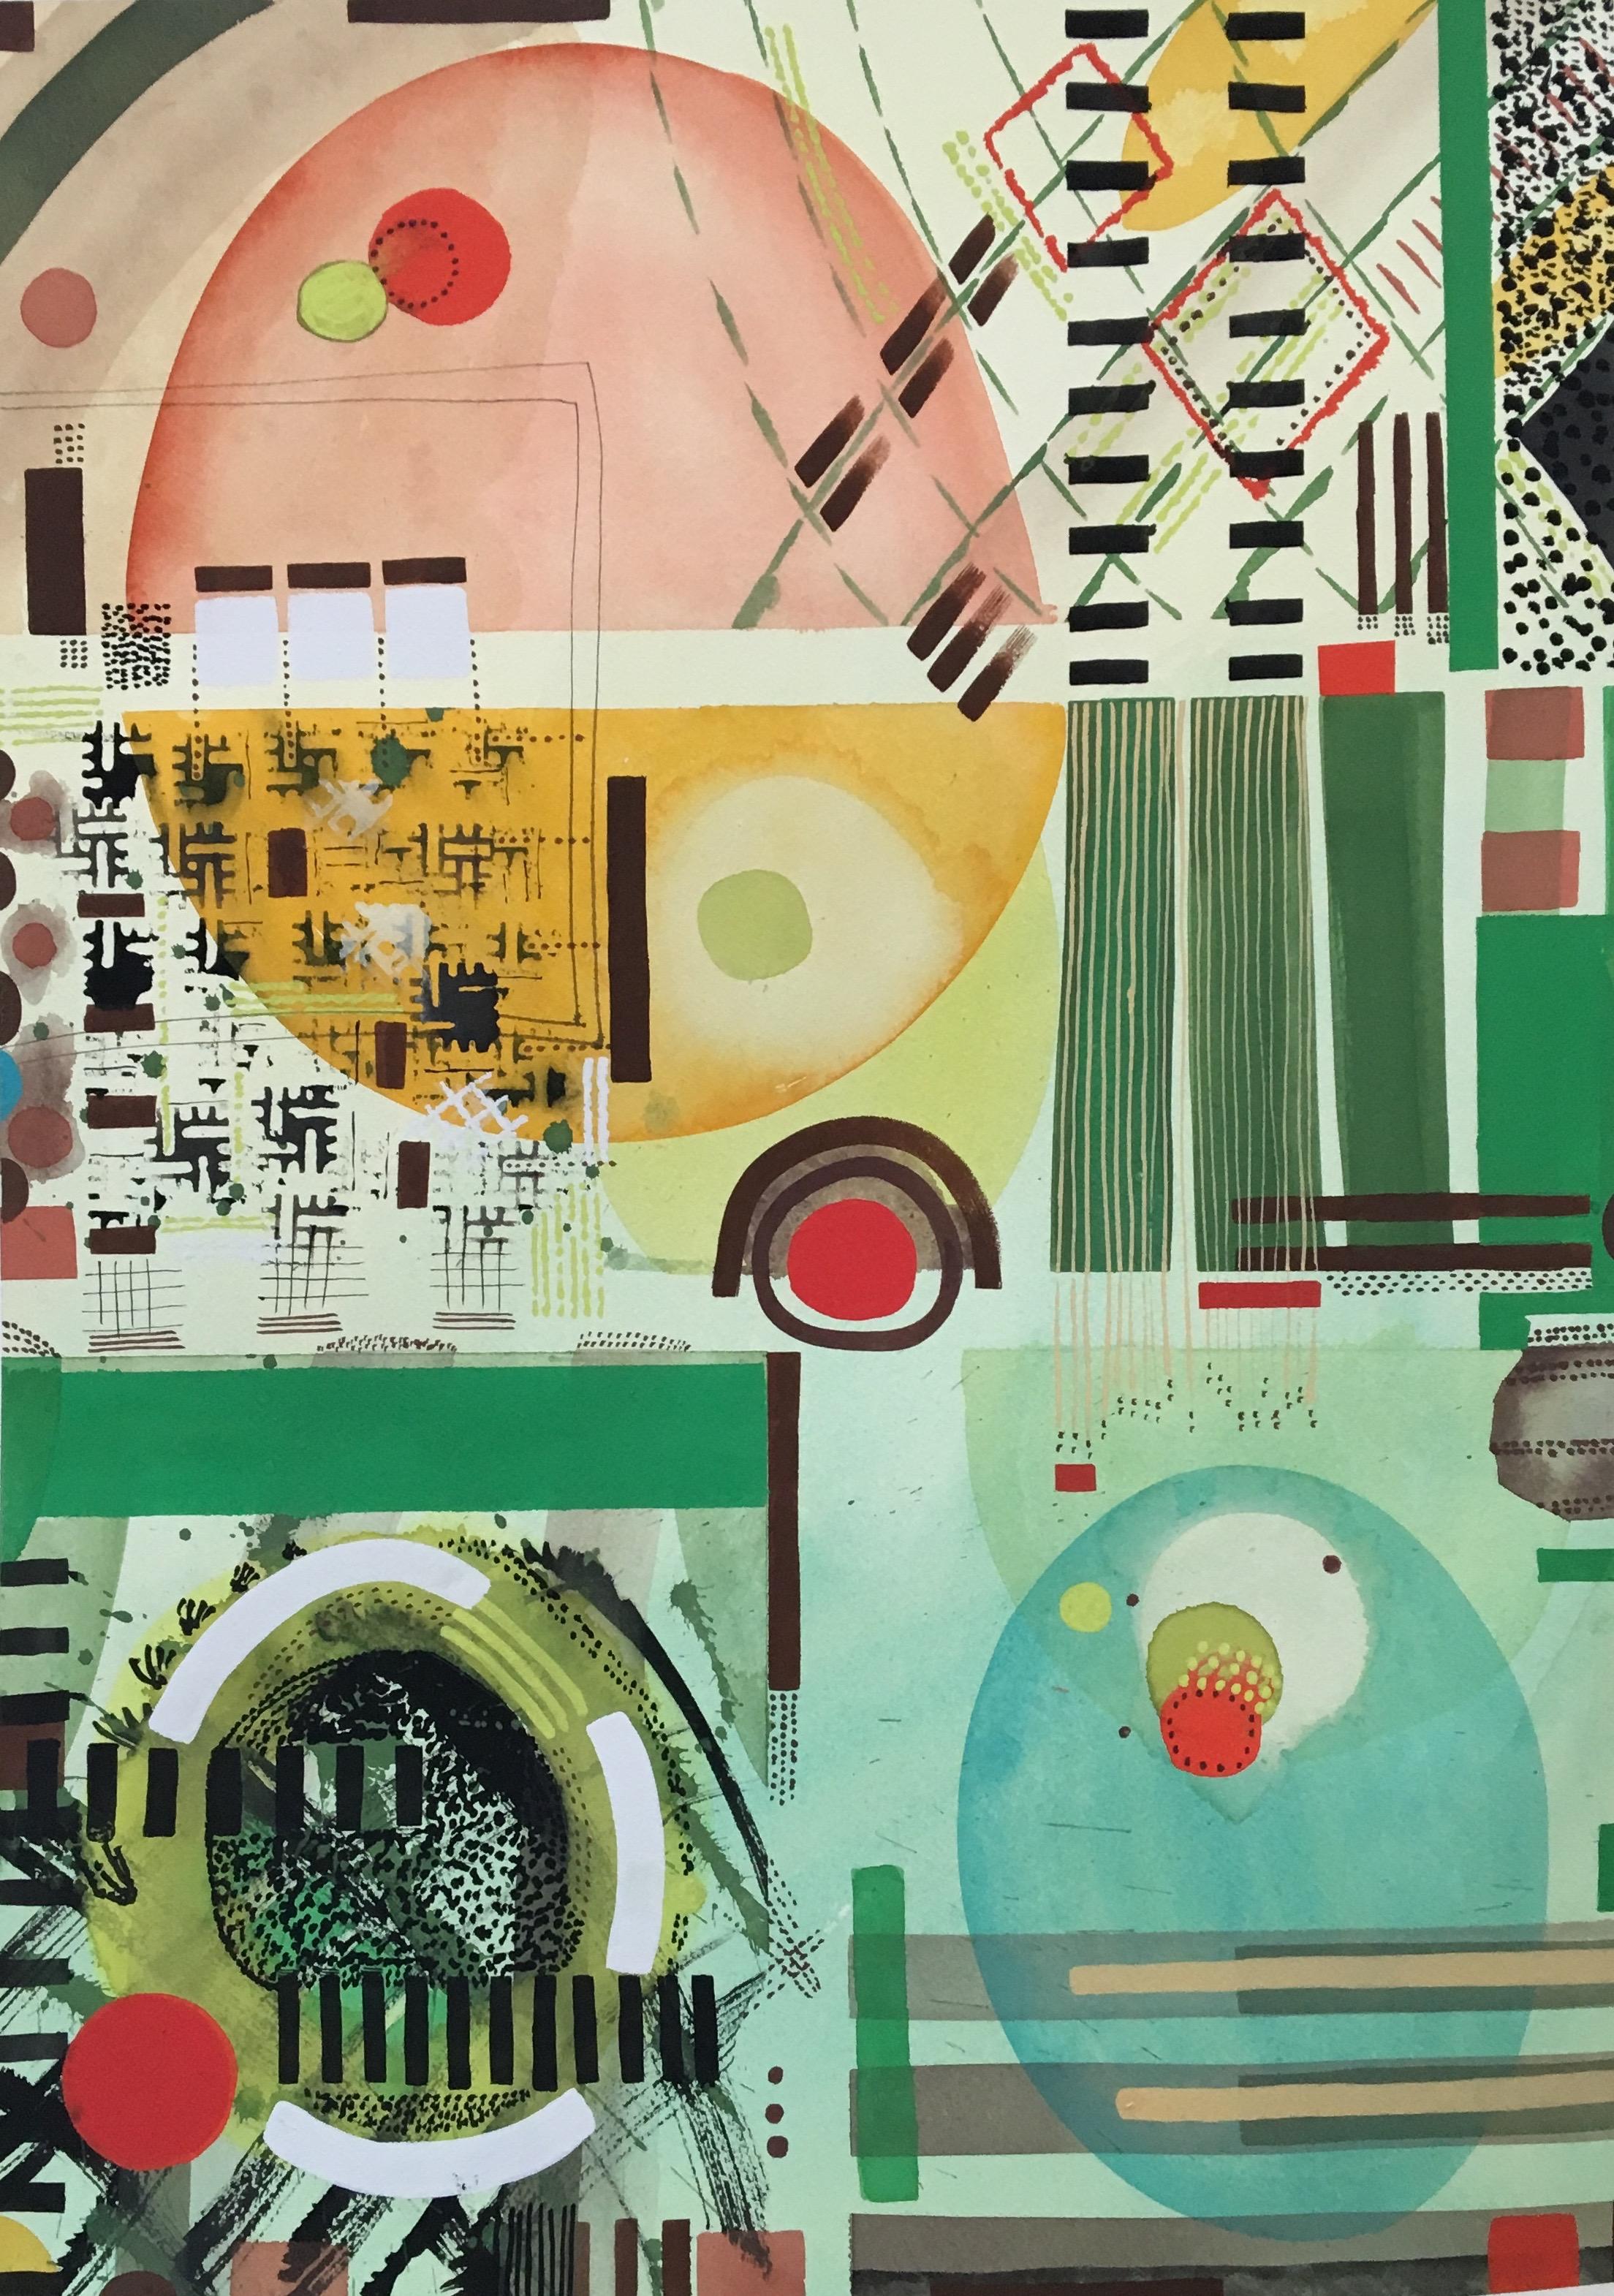 Contemplations complex, spring 2019 B, gouache on paper, 65 x 45 cm